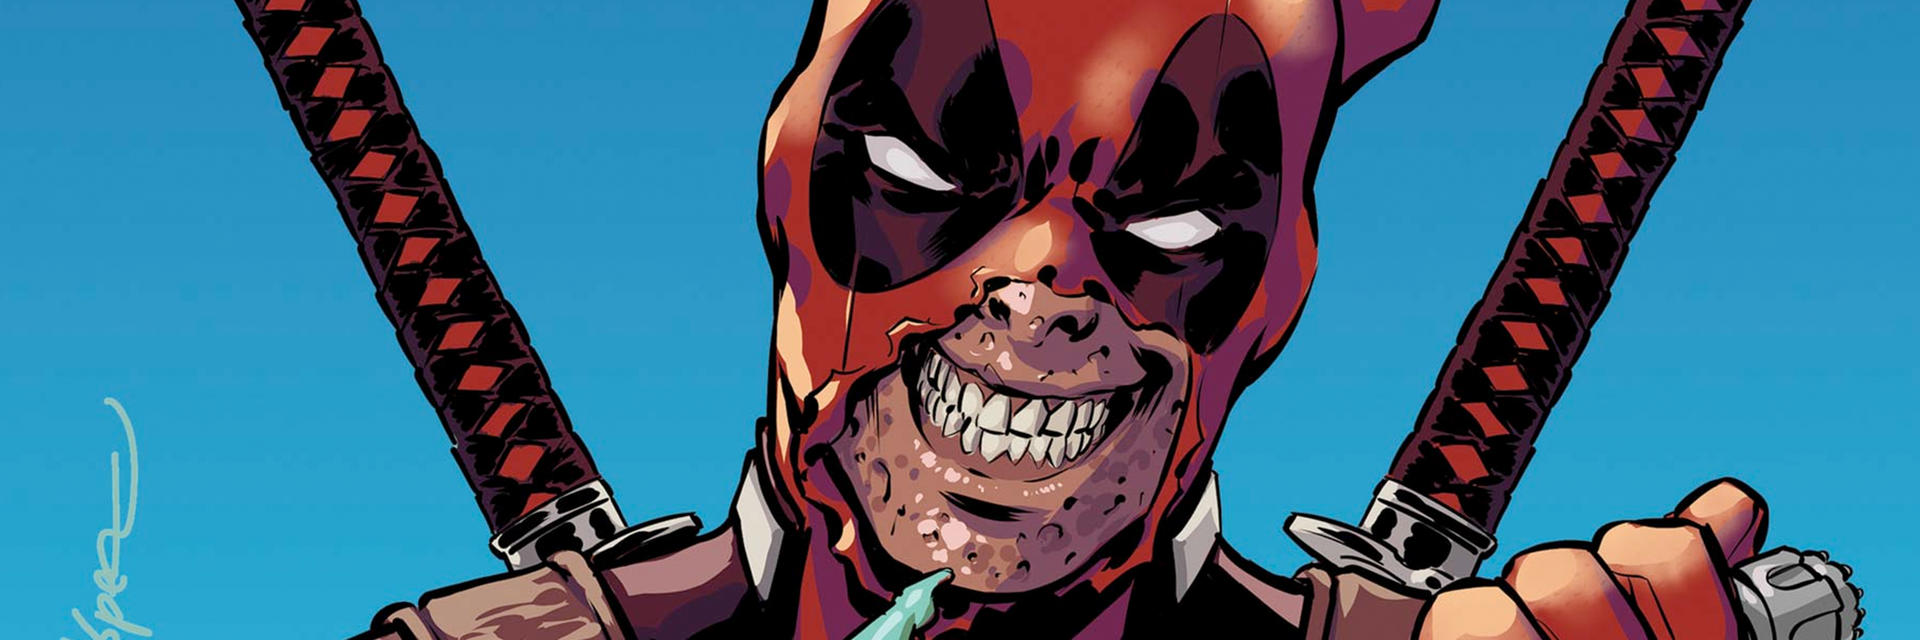 4541b455c Deadpool (Wade Wilson) In Comics Powers, Villains, Abilities | Marvel